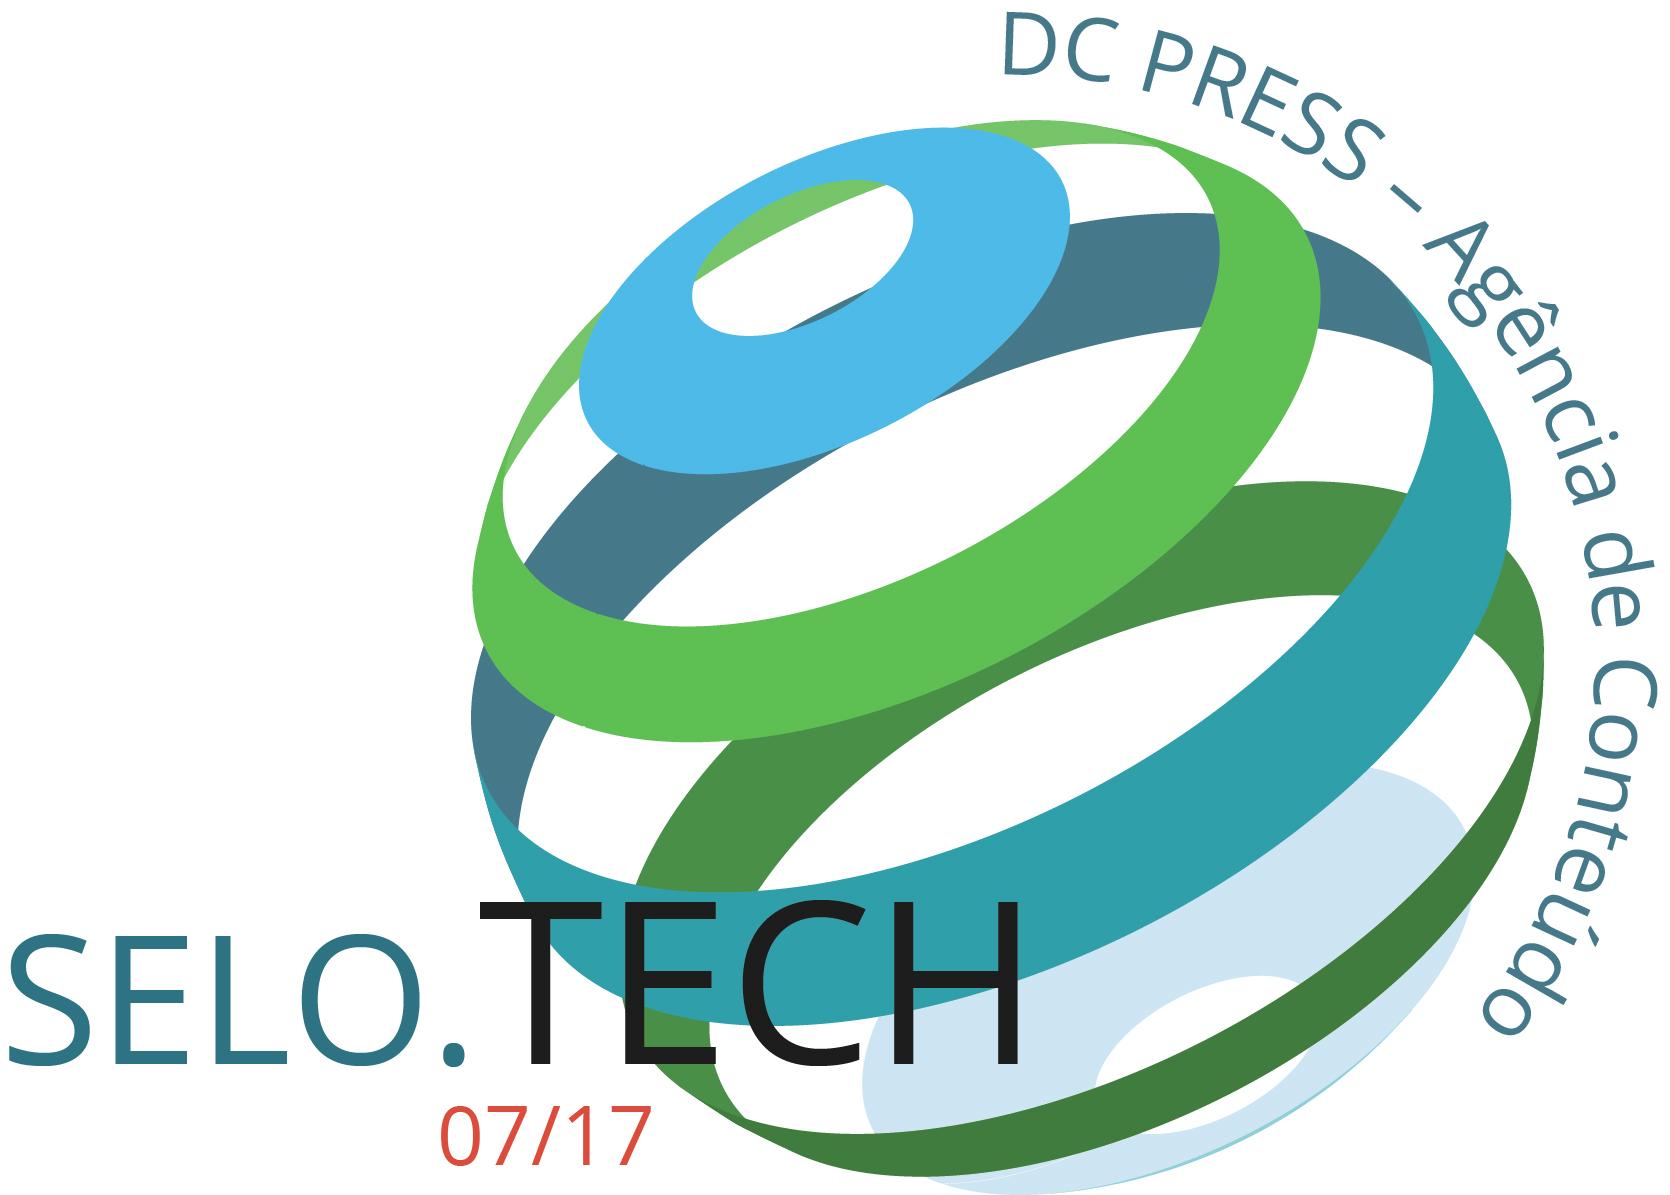 selotech_DCPRESS (1)